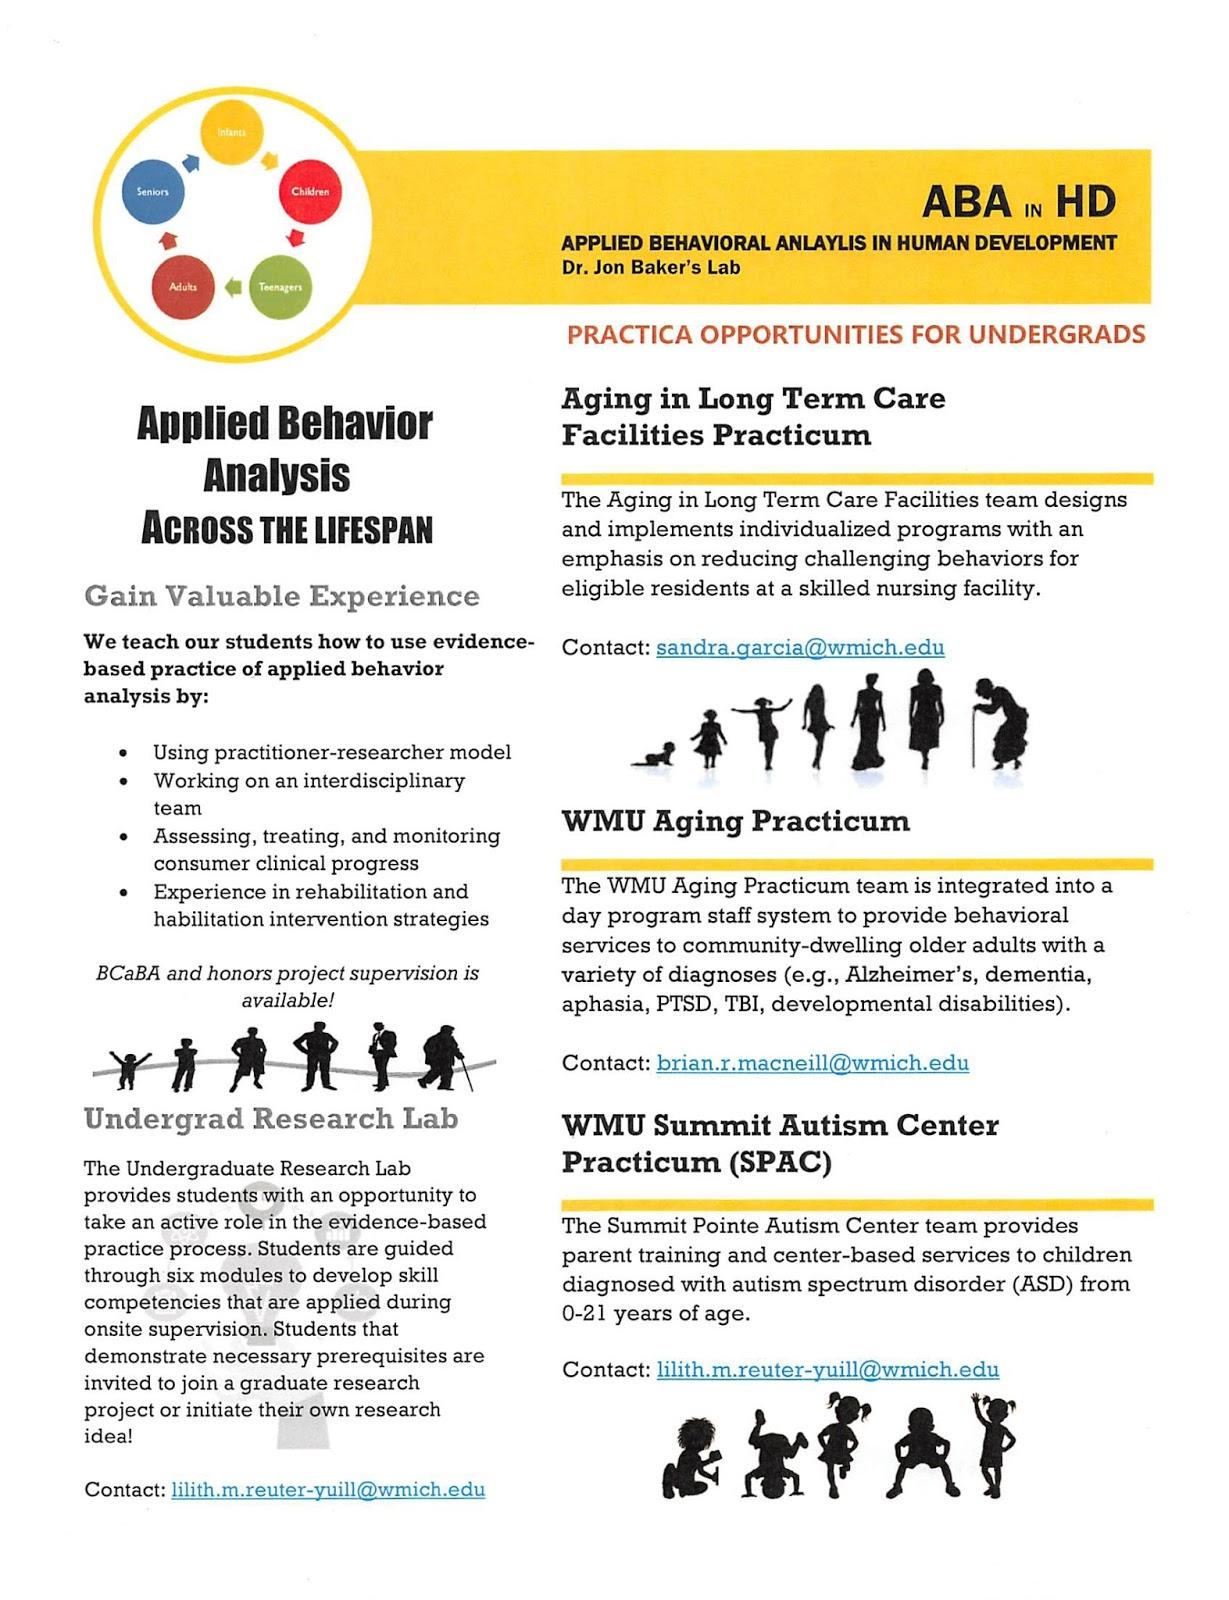 reaction paper school childhood development psychology understanding human behavior childhood experi